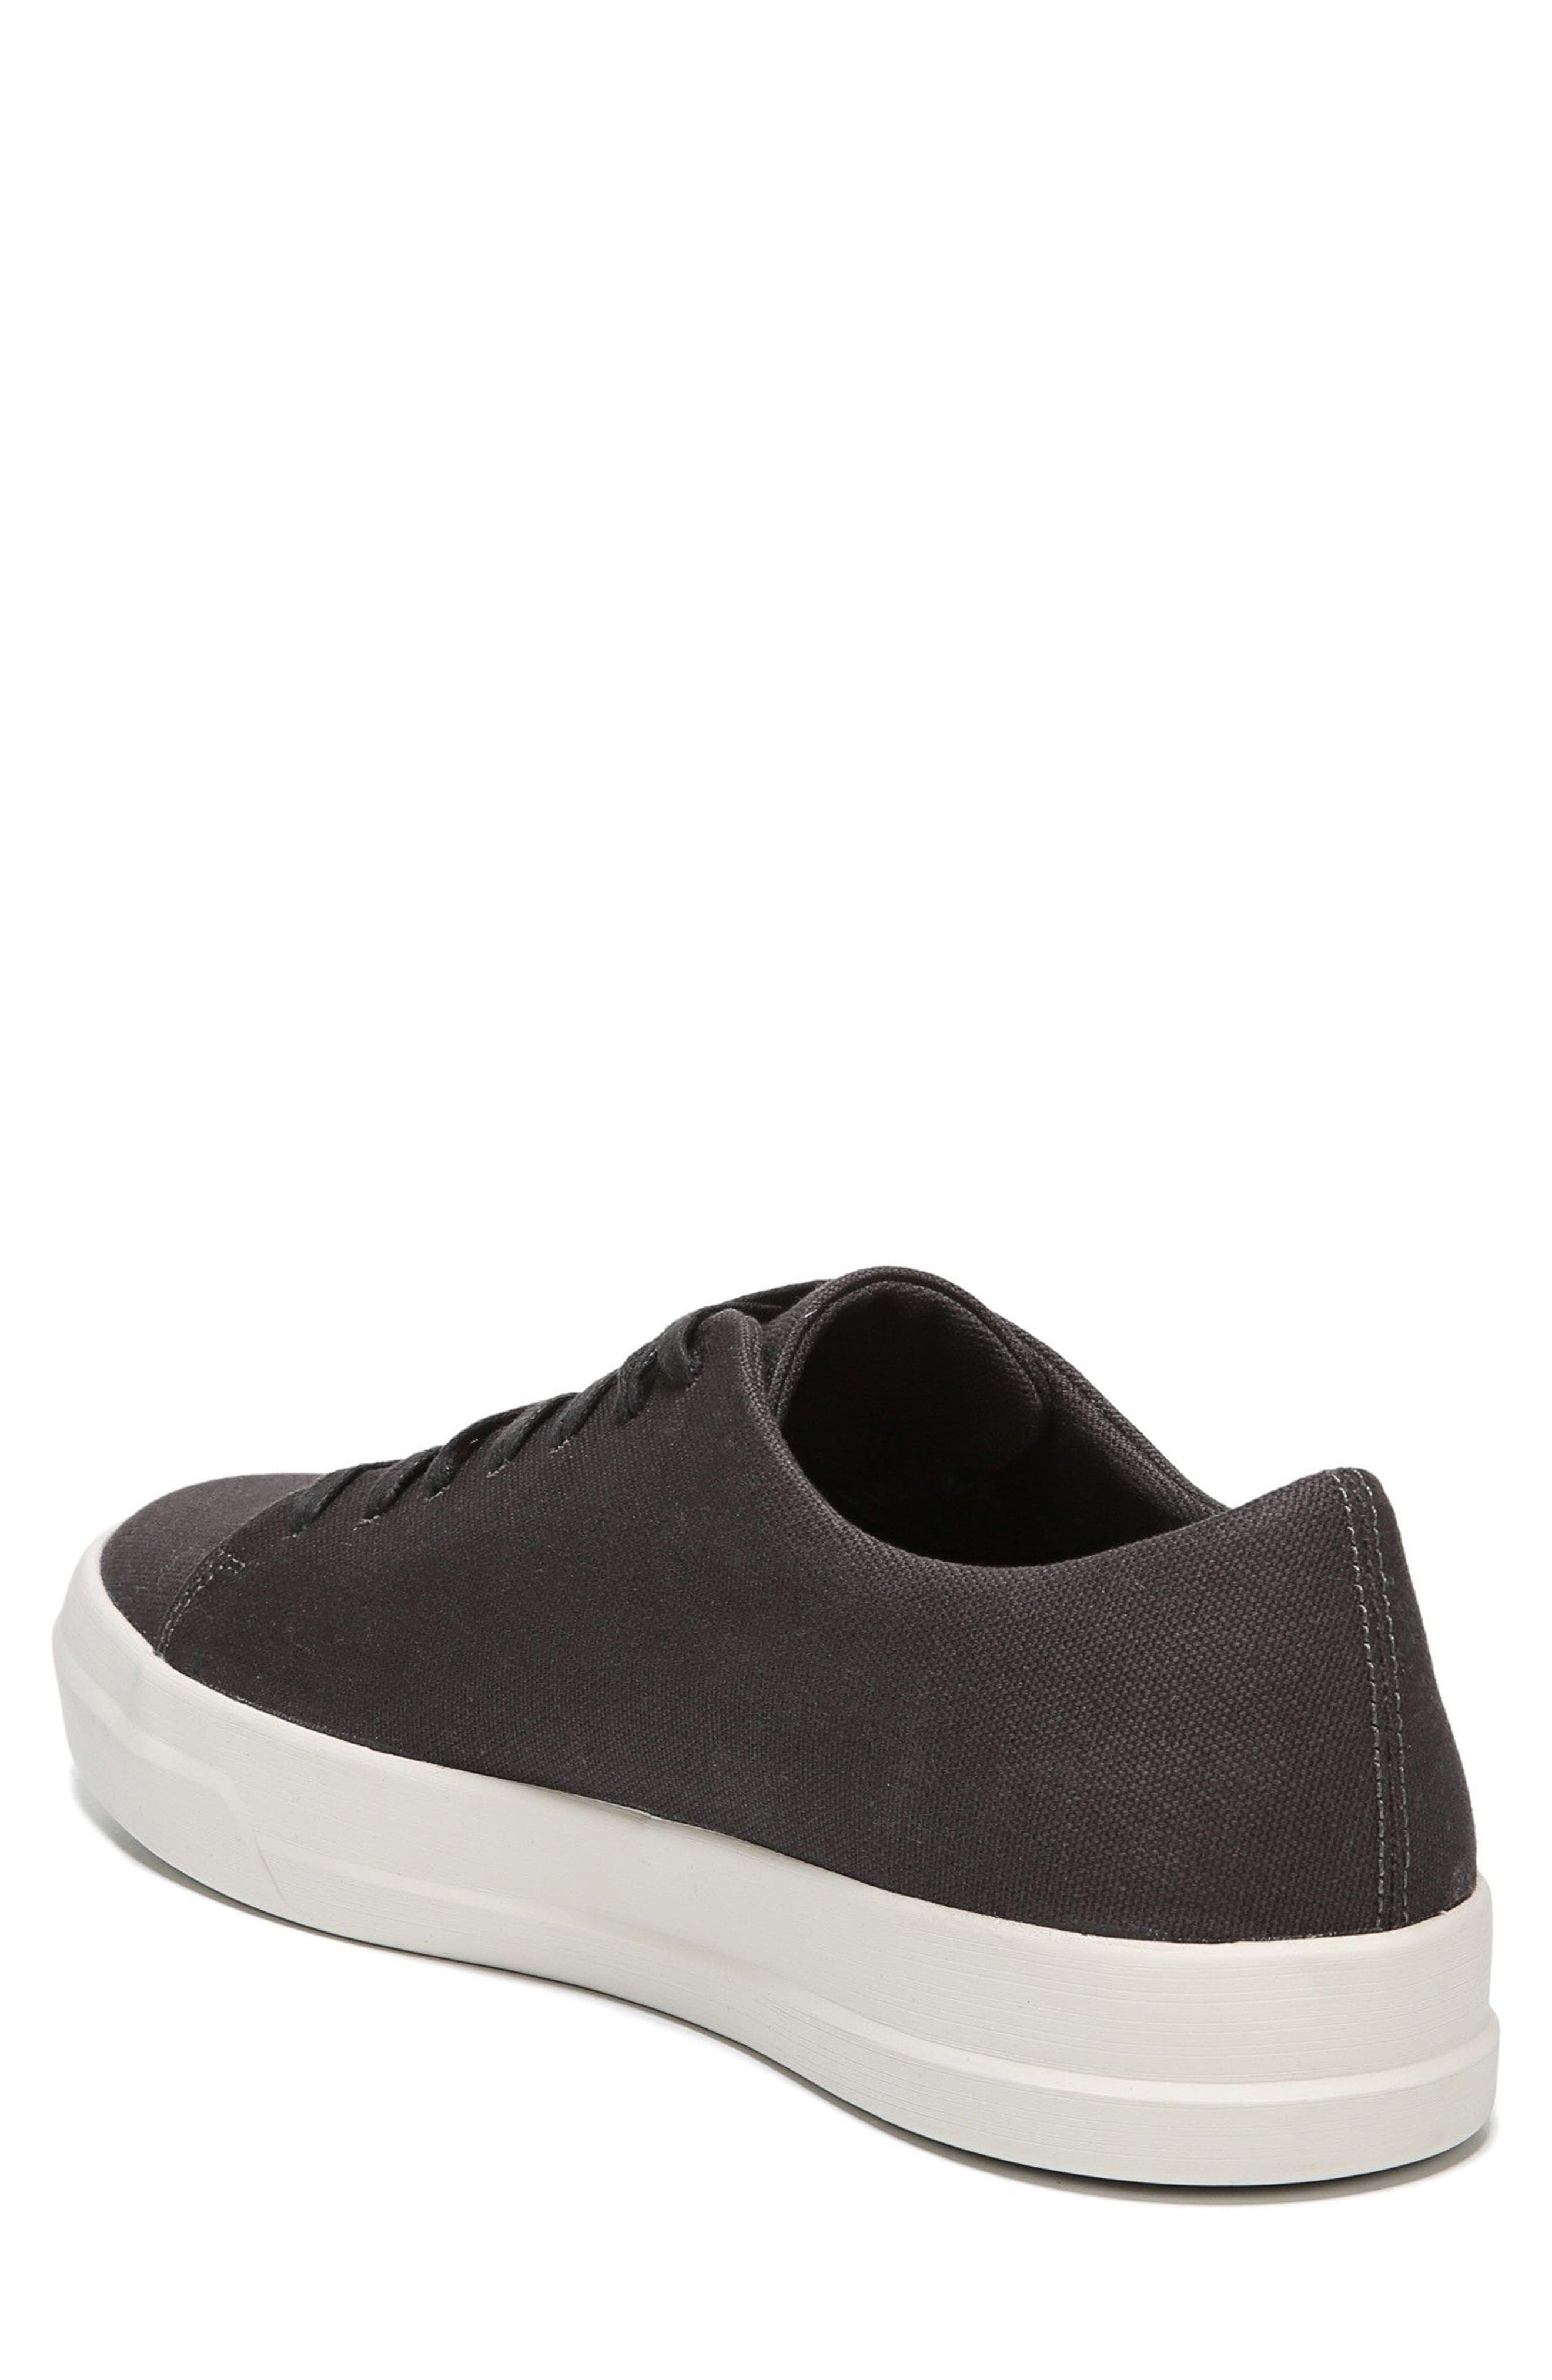 ,                             Copeland Sneaker,                             Alternate thumbnail 29, color,                             021